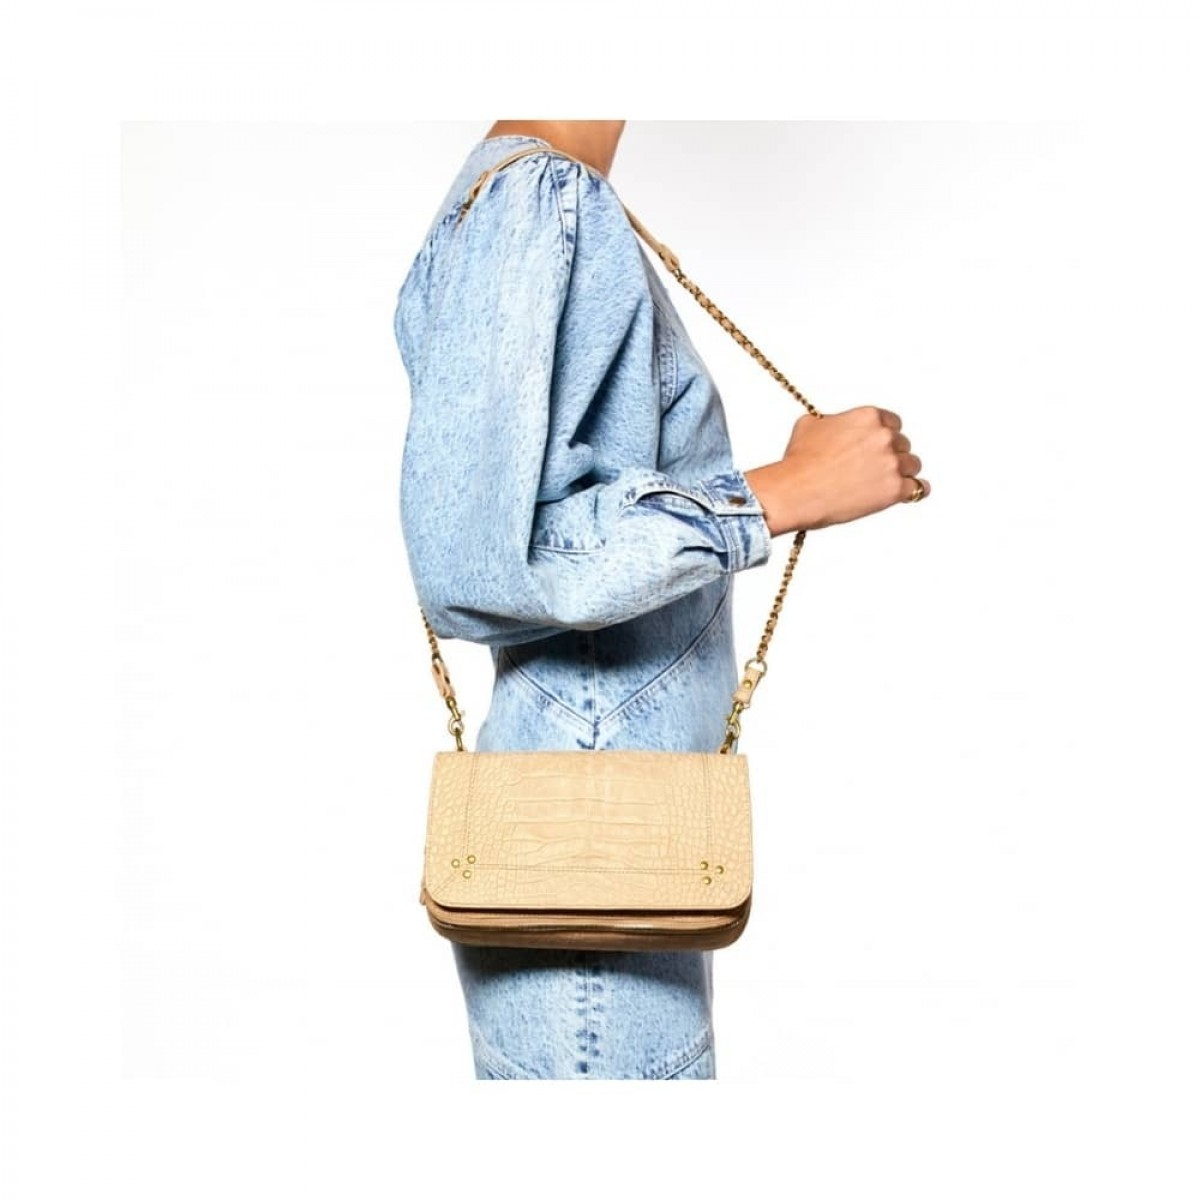 bobi taske - croco ficelle - model fra siden